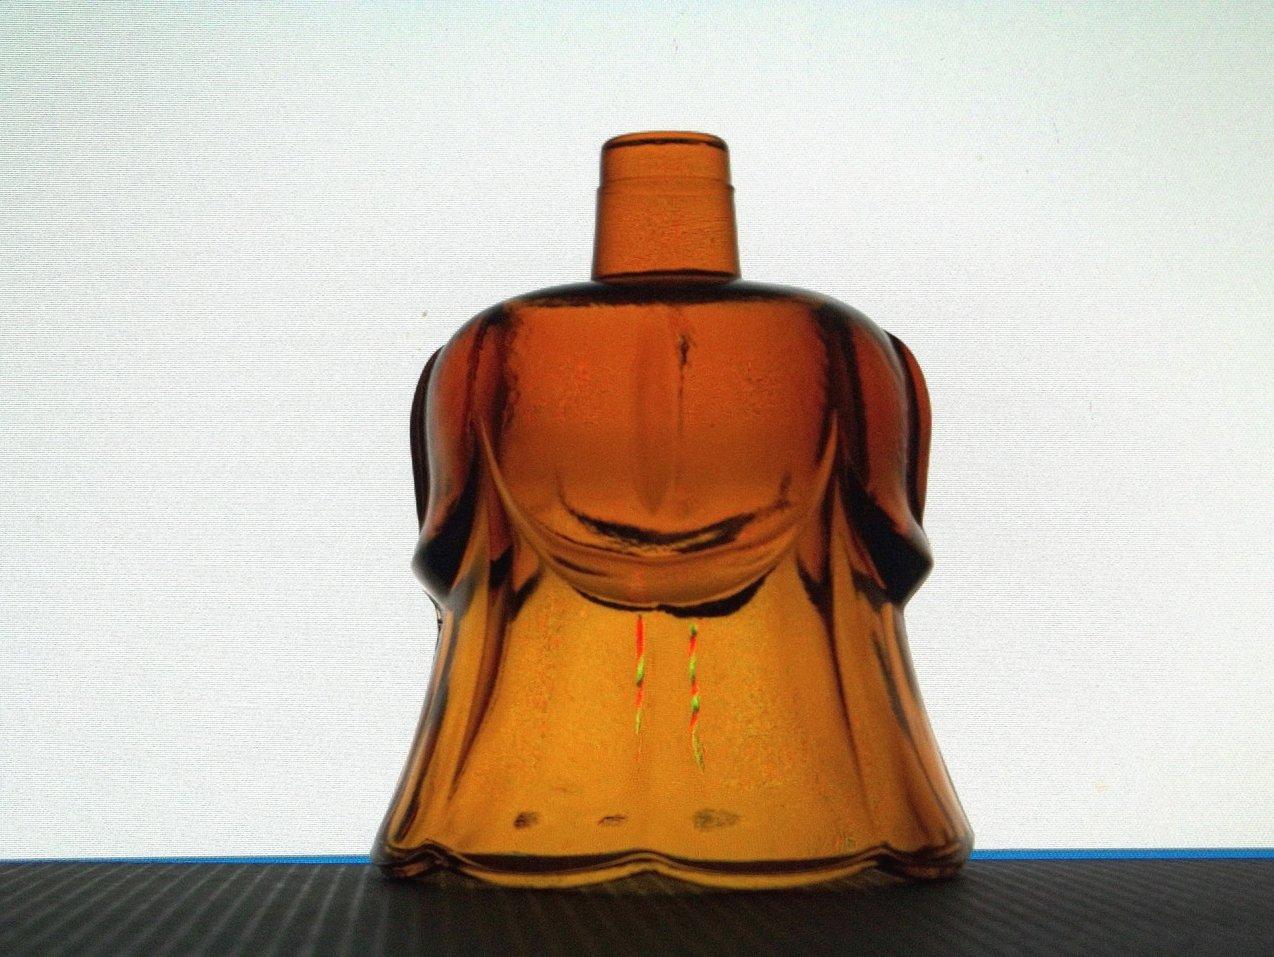 Home Interiors Peg Votive Holder Lotus Cup Amber 1197